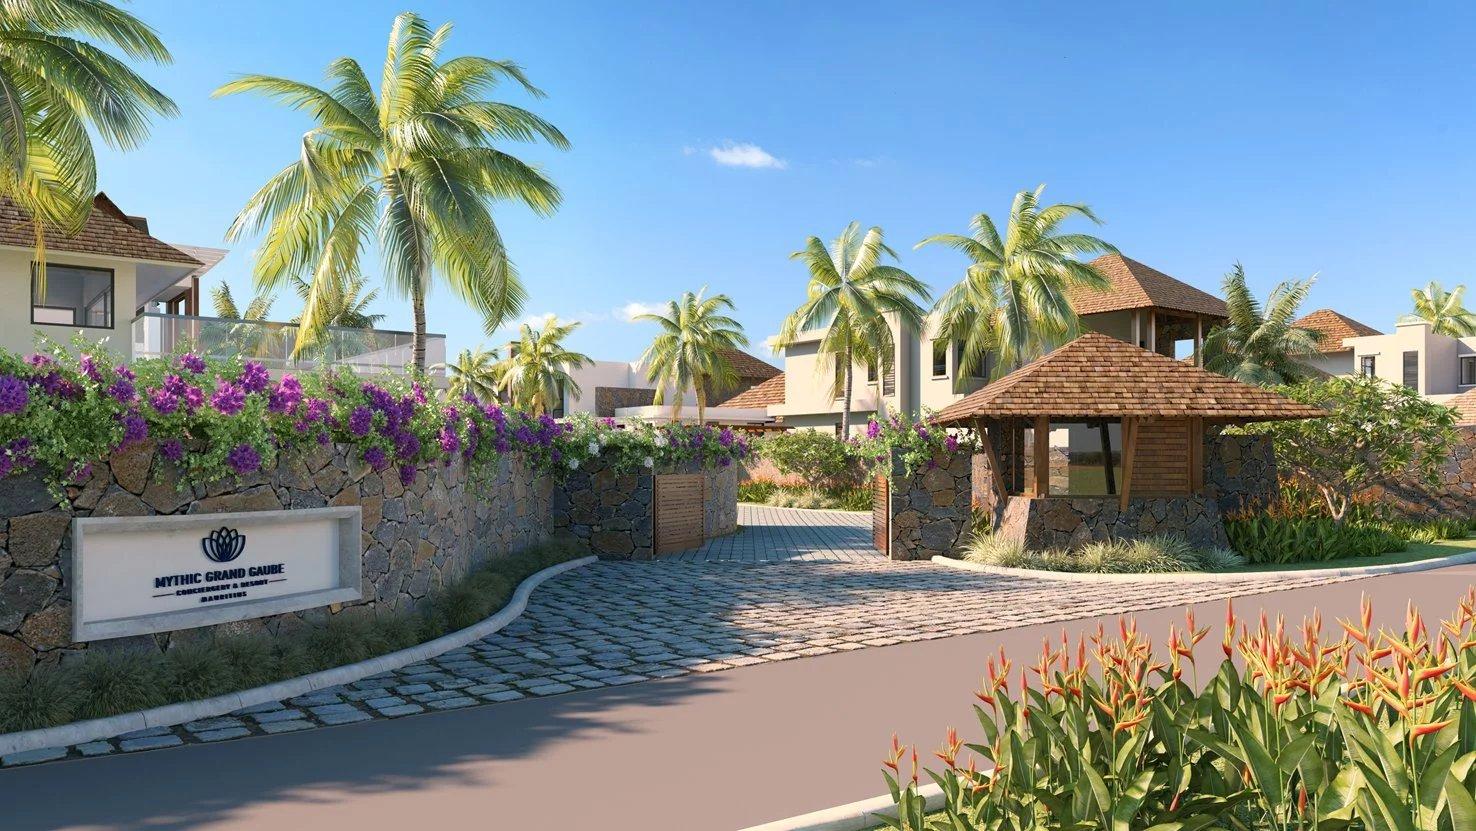 Villa in a Five star resort and conciergerie